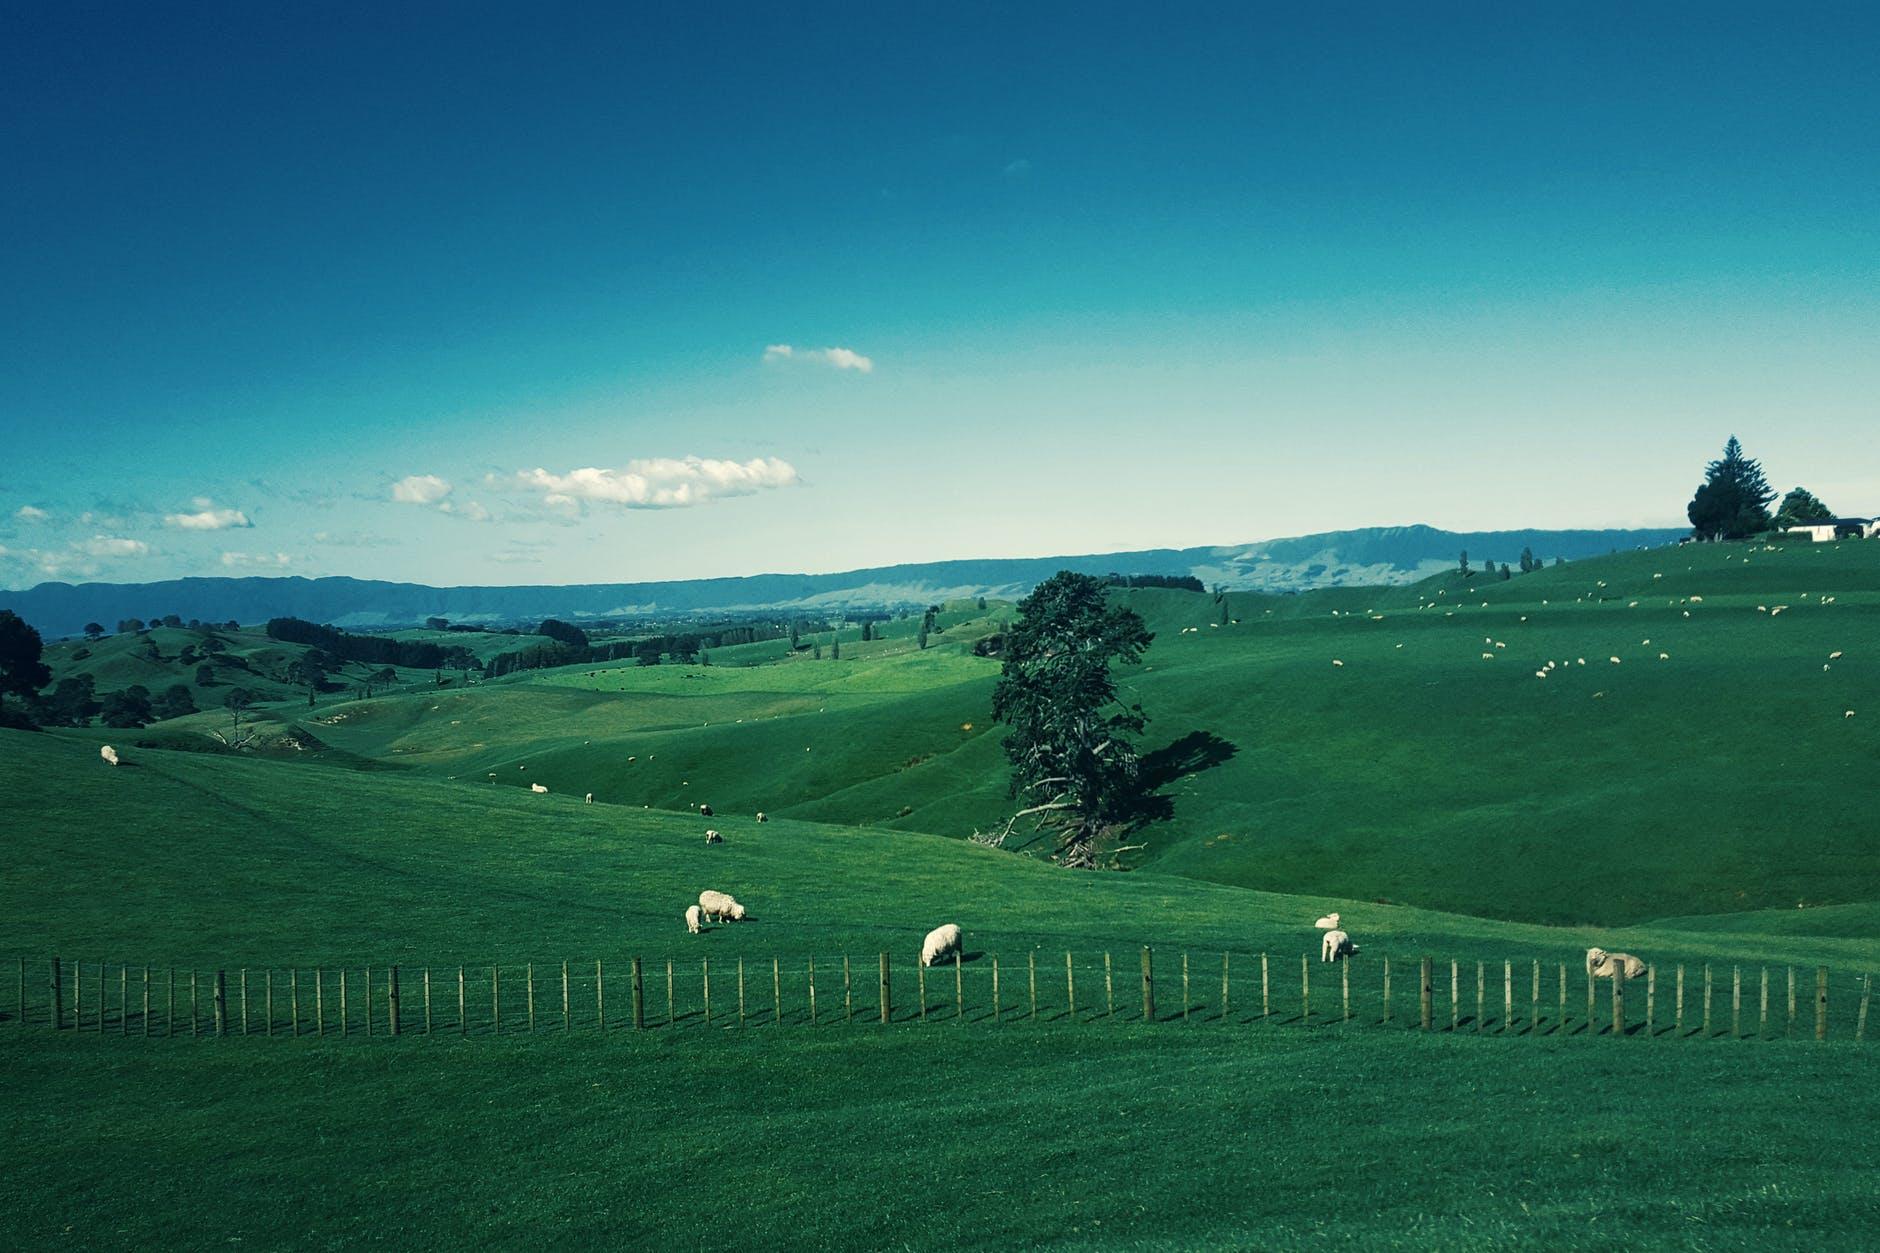 Our last stop: Dunedin, New Zealand